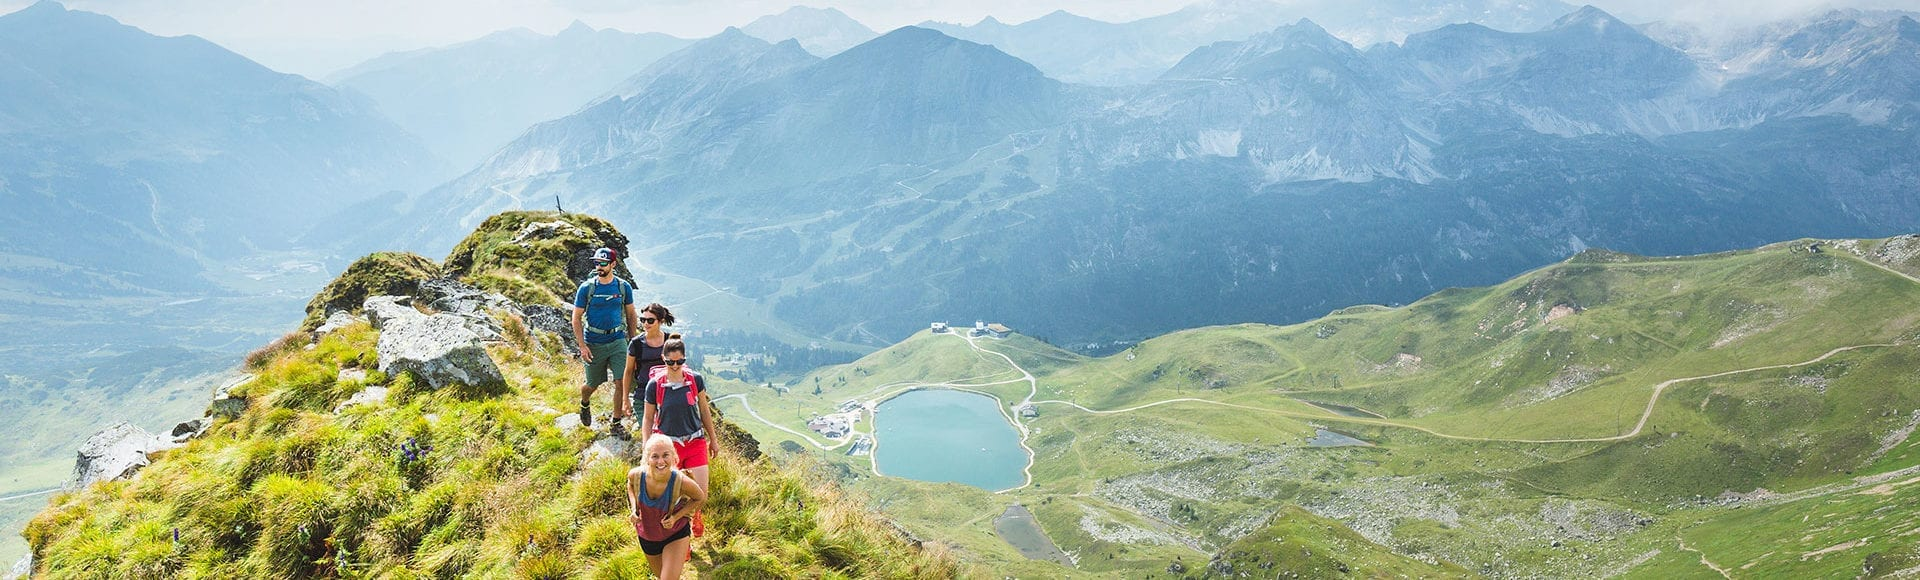 Wandern in Obertauern